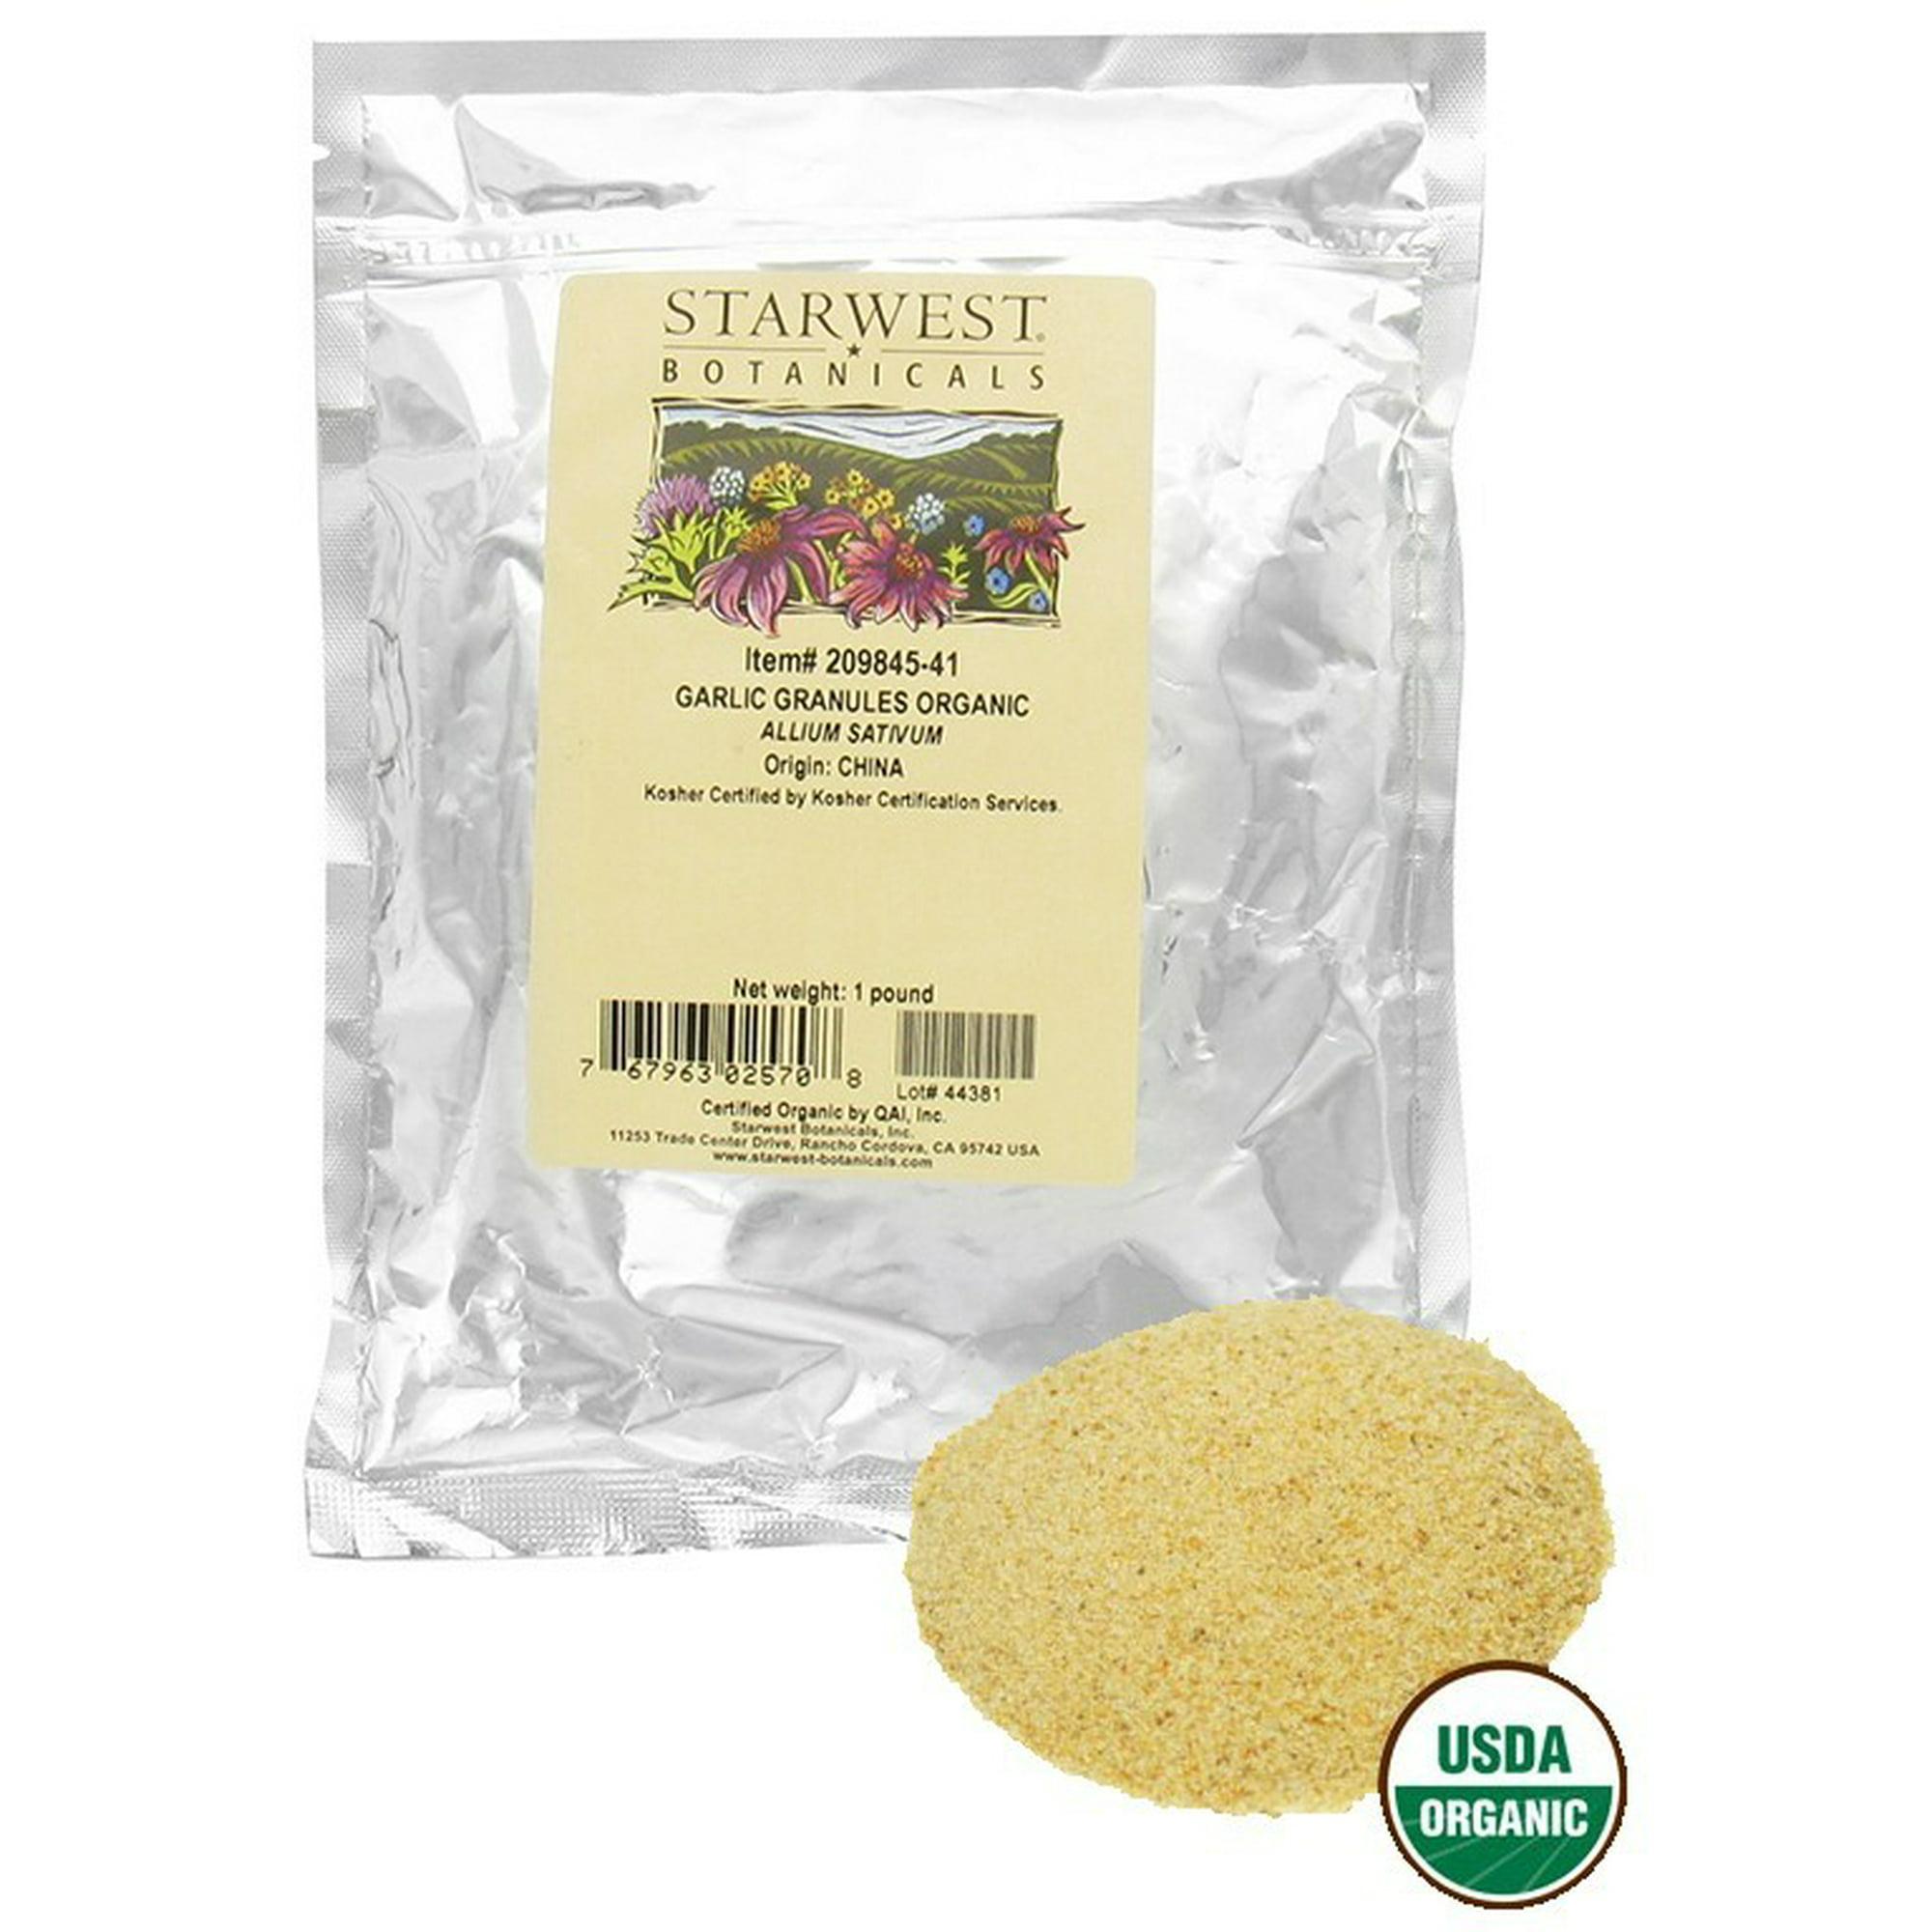 Buy Starwest Botanicals - Bulk Garlic Granules Organic - 1 lb